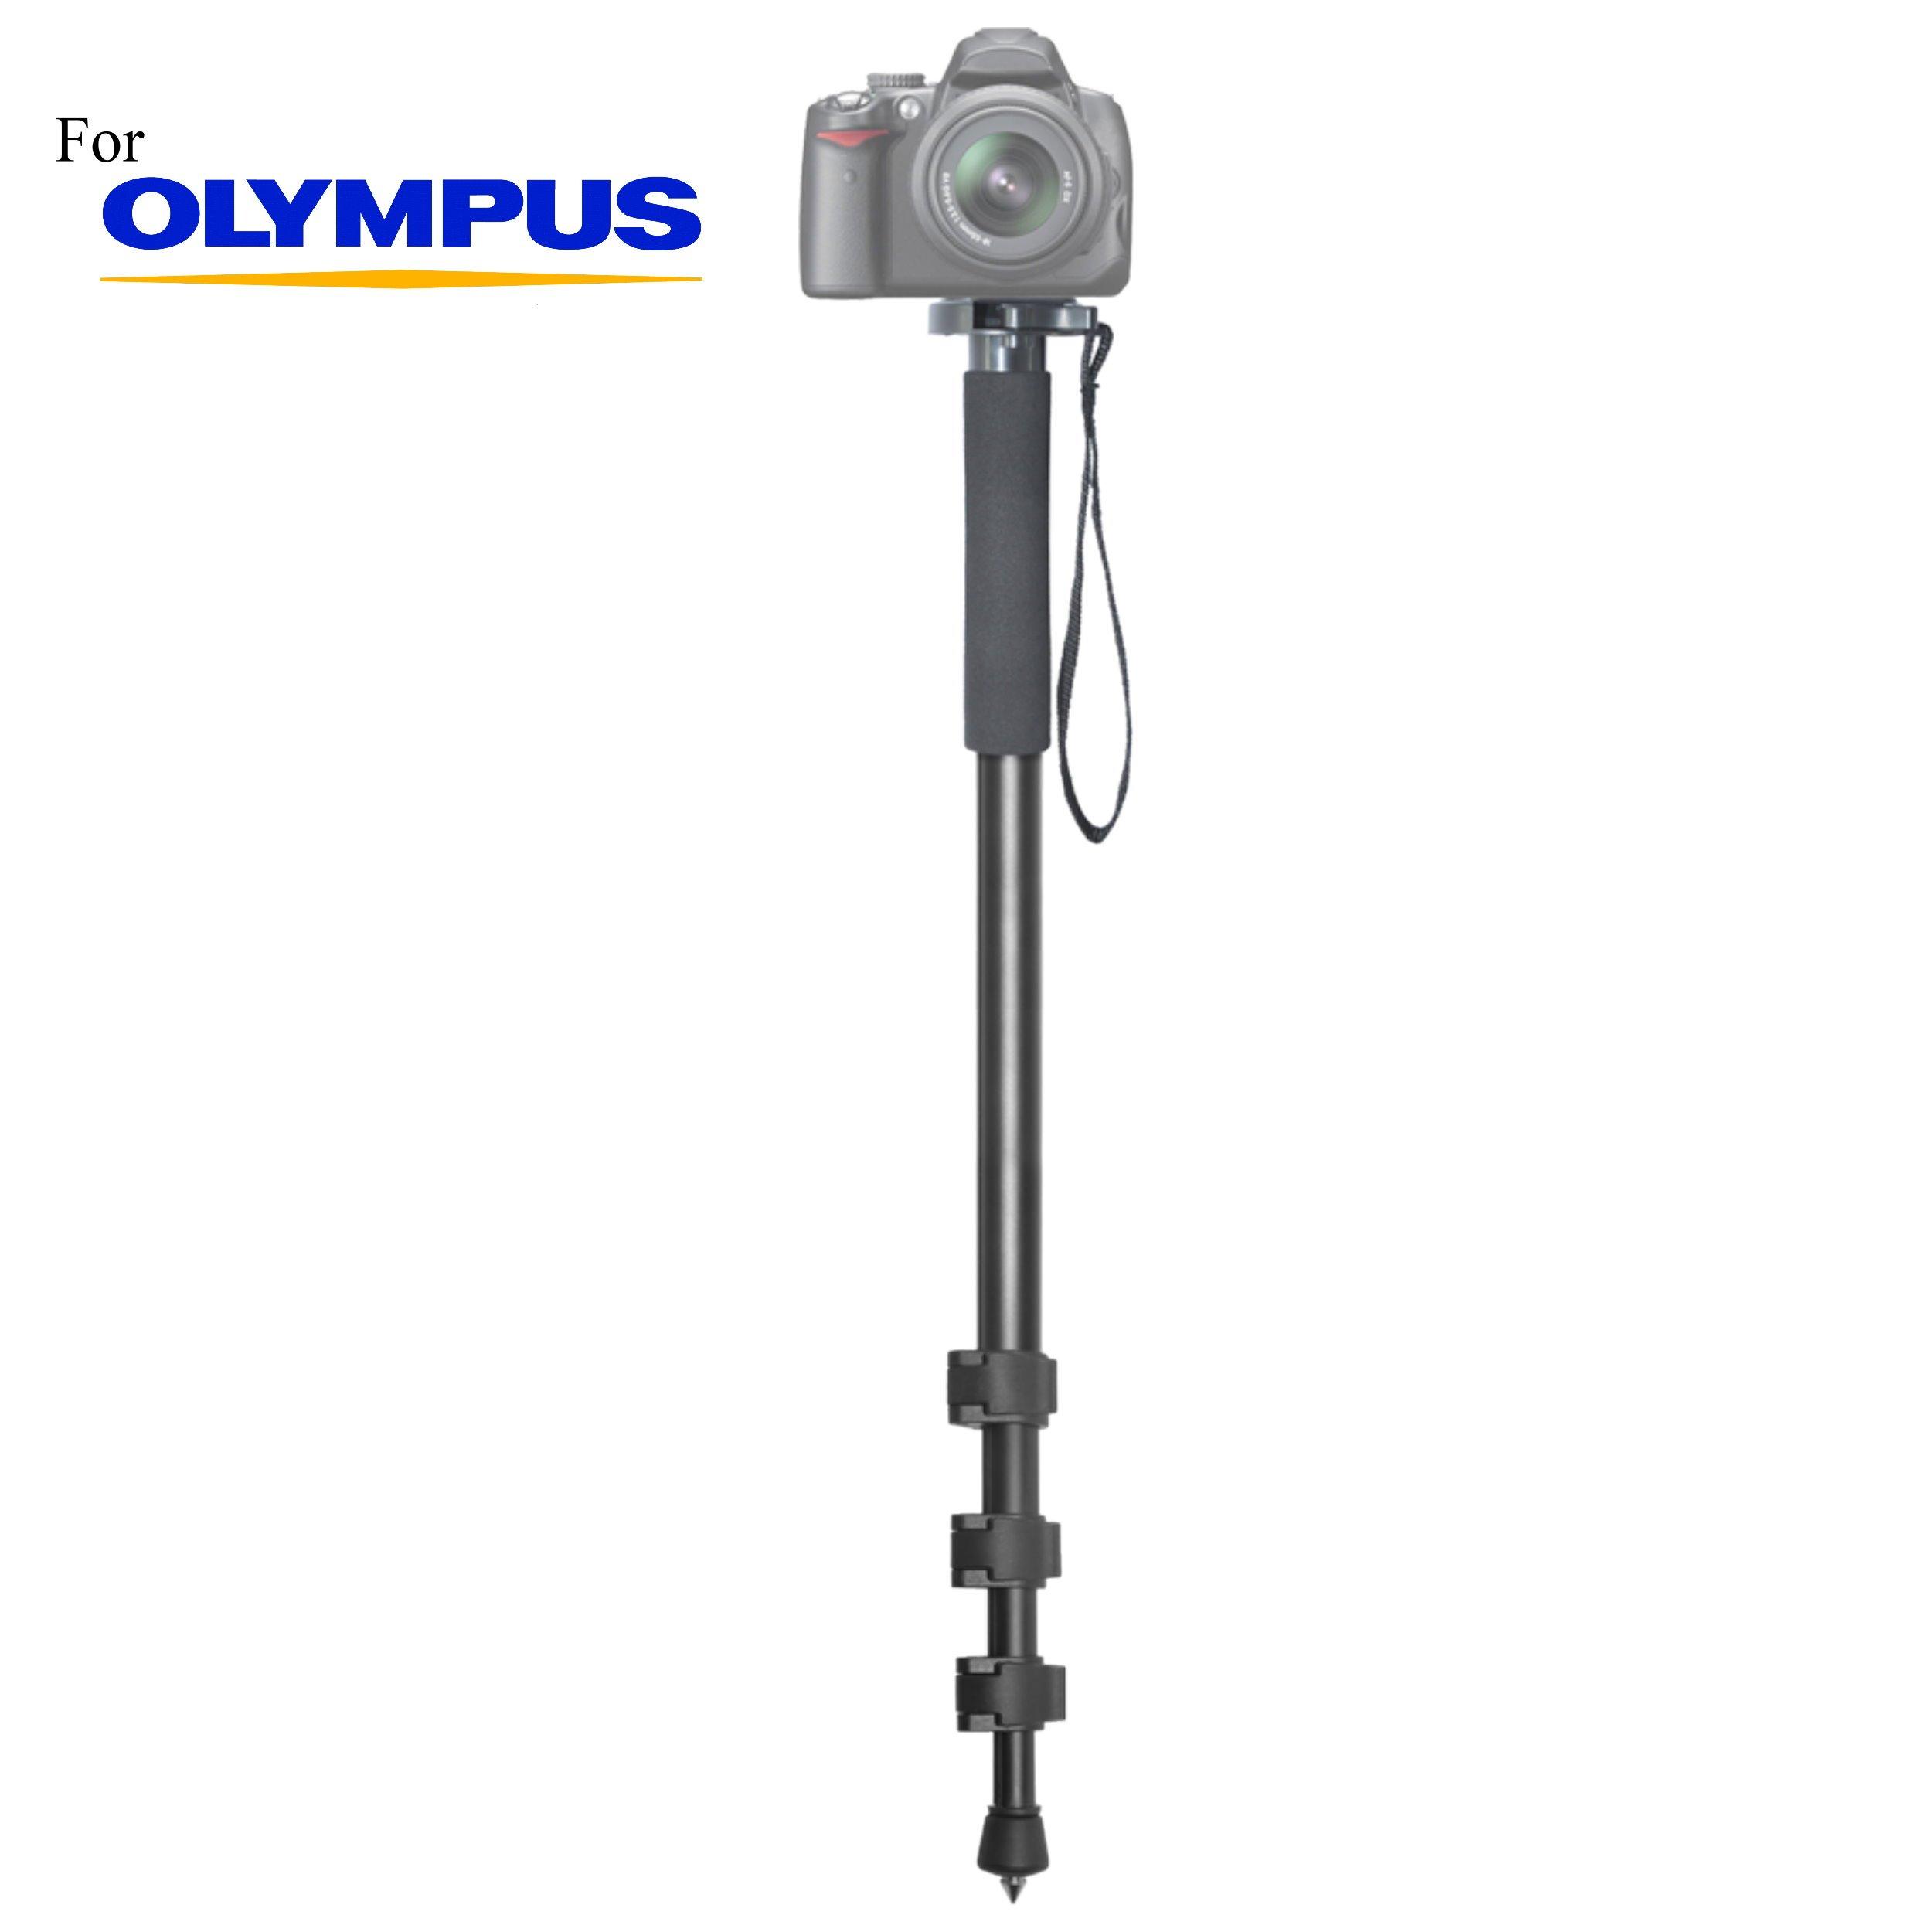 Versatile 72'' Monopod Camera Stick + Quick Release for Olympus SP-565UZ, SP-570 UZ, Stylus 1, Stylus 1s, XZ-1, XZ-2 iHS, E-400 Pro Digital Cameras: Collapsible Mono pod, Mono-pod